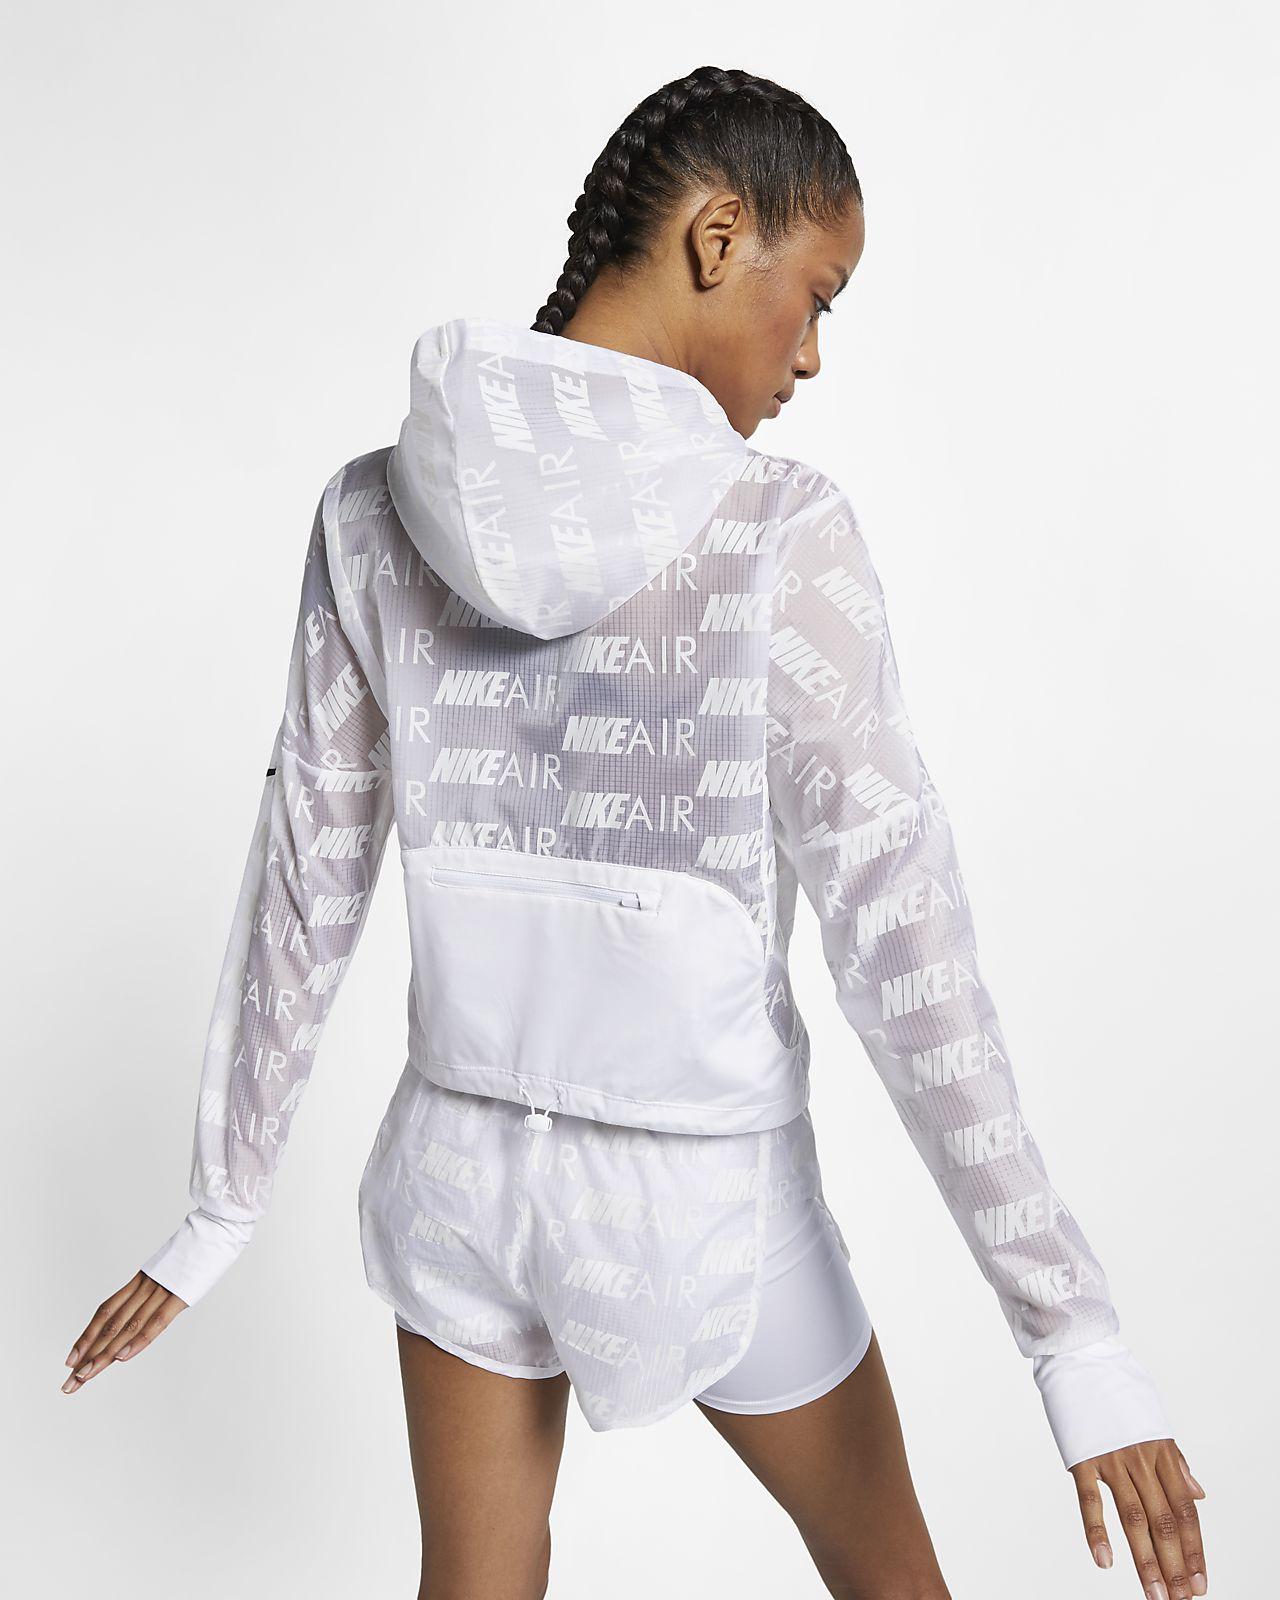 174e76ee21 Veste de running à capuche Nike Air pour Femme. Nike.com FR